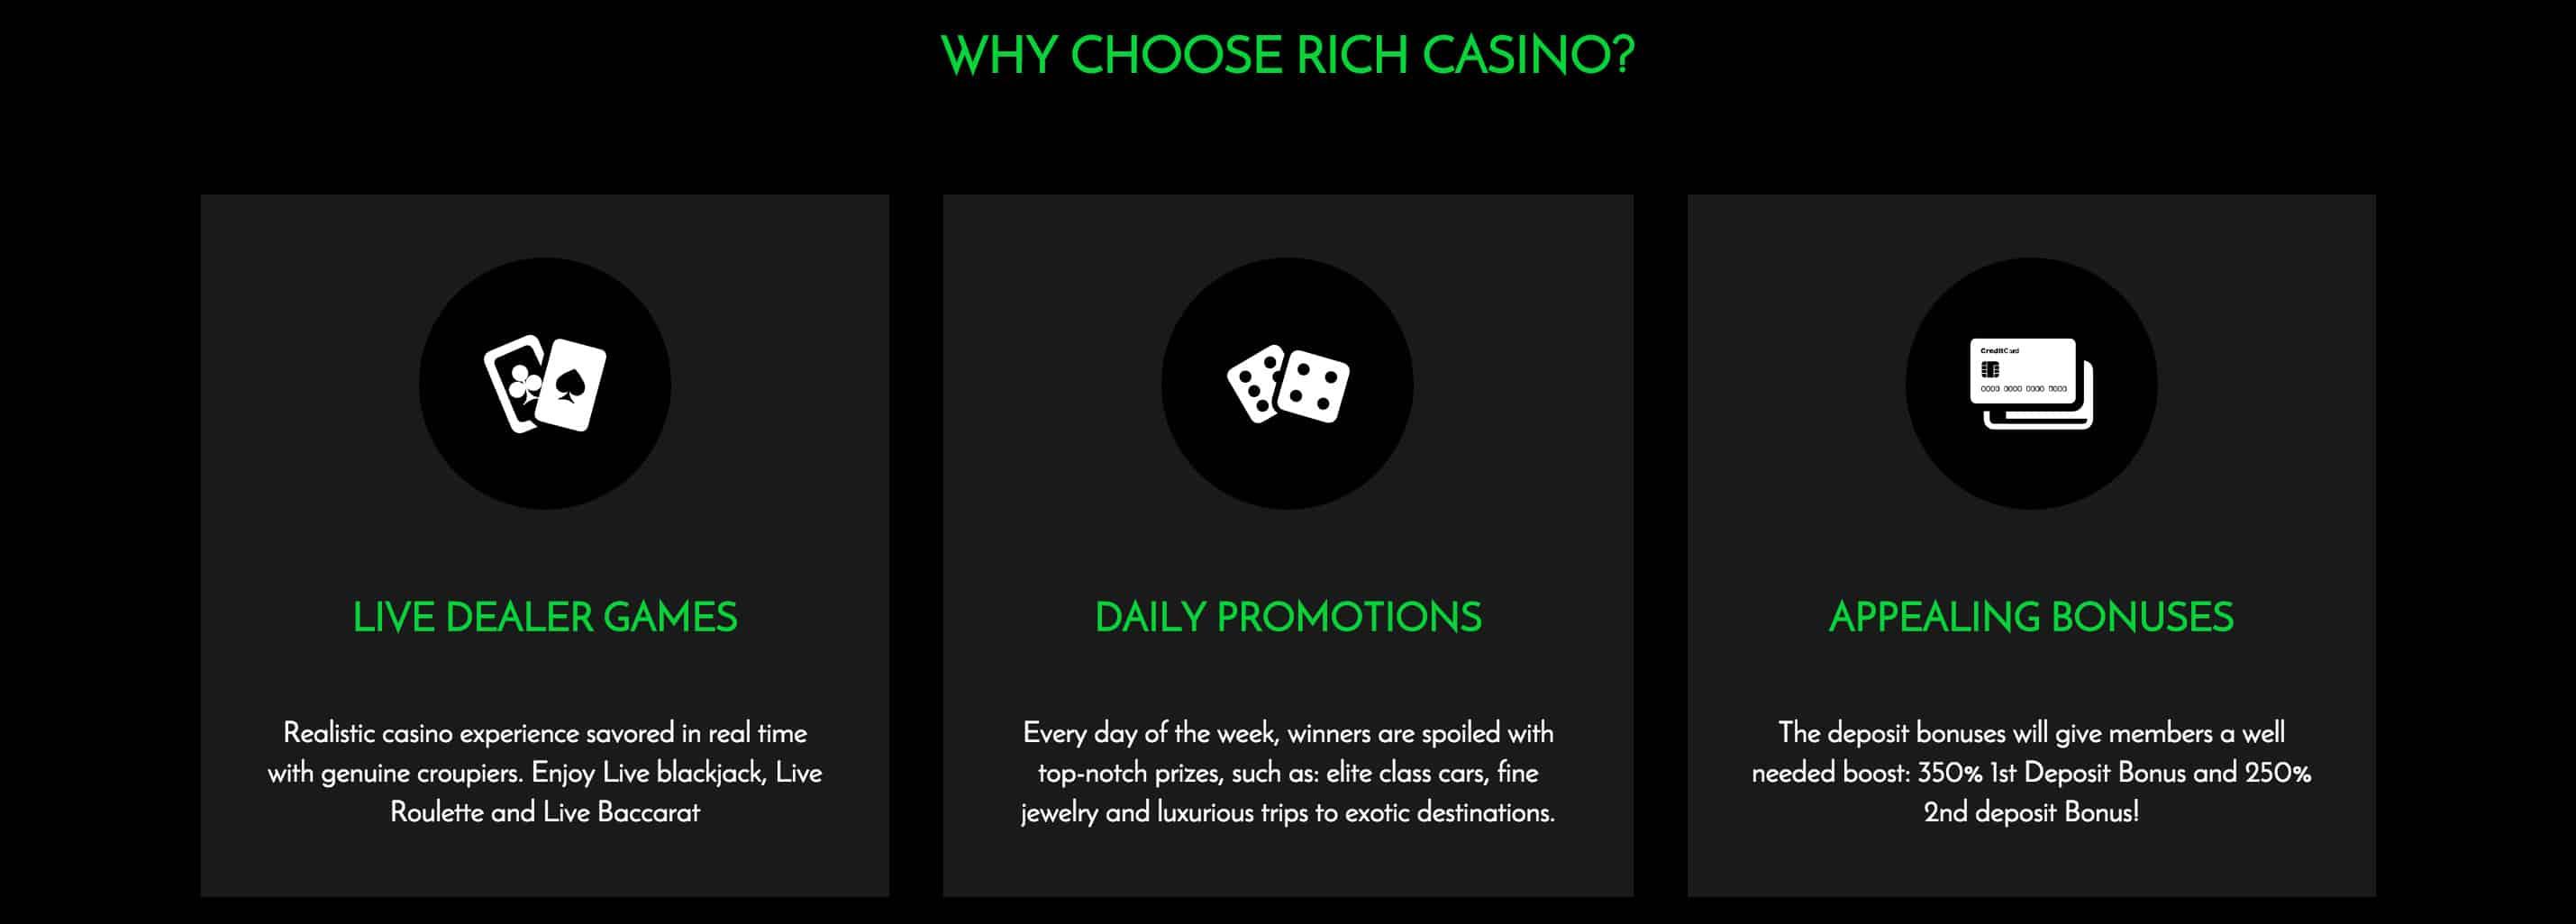 Bingo on line español rich casino México-308248